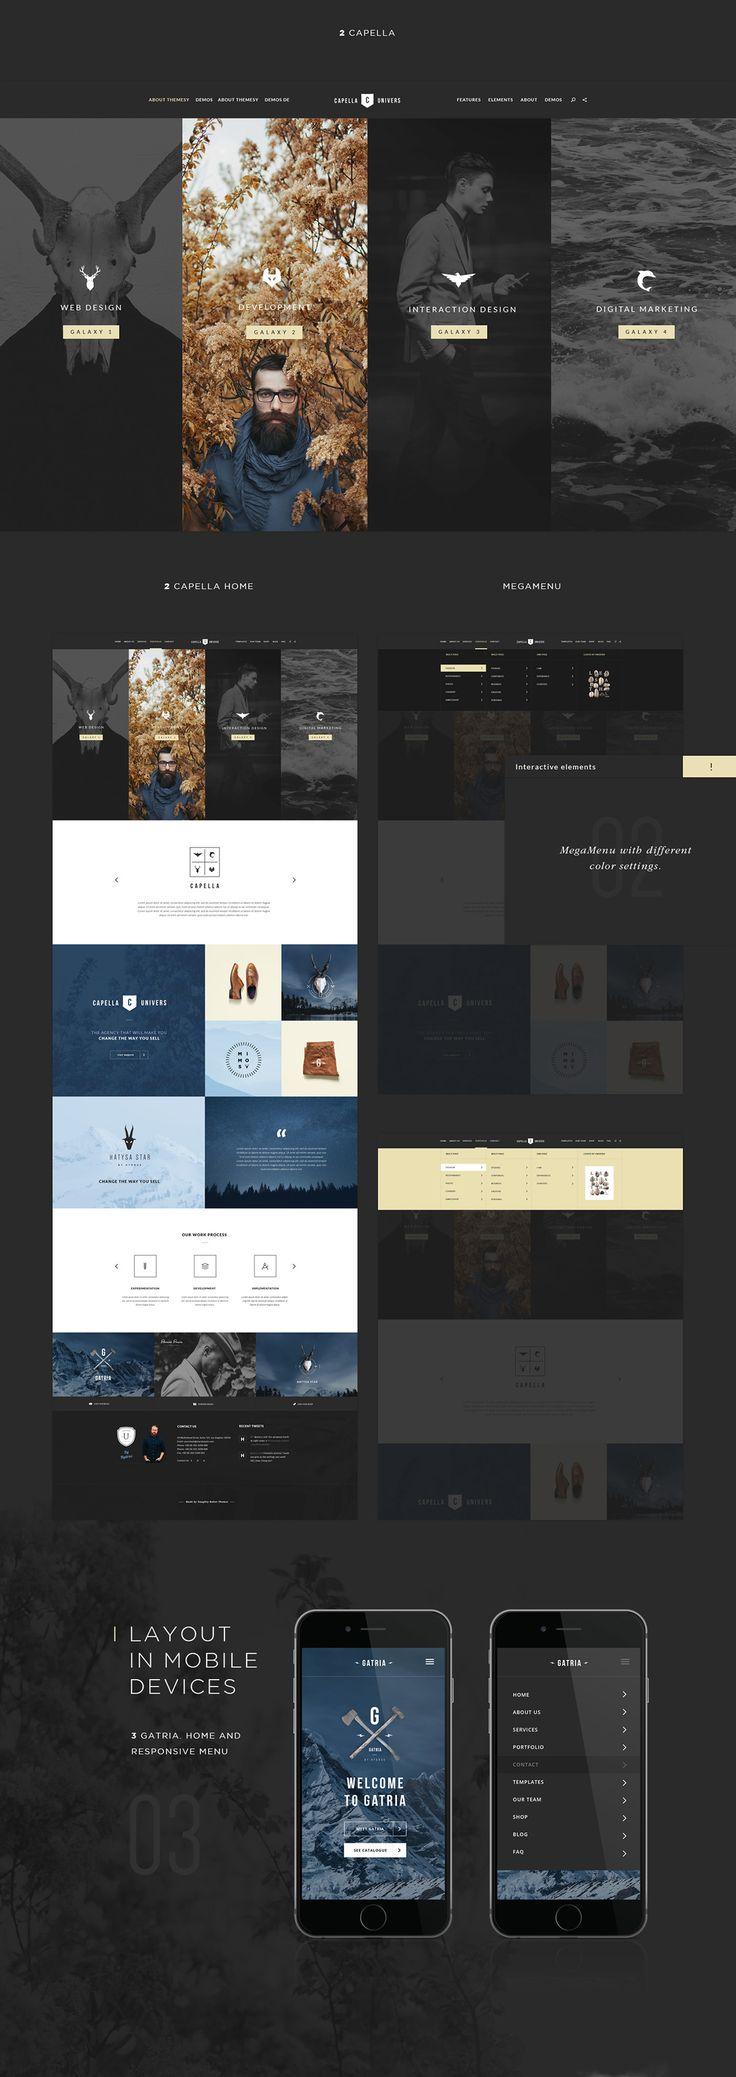 Hydrus on Web Design Served. Best 25  Web gallery ideas on Pinterest   Gallery website  Web